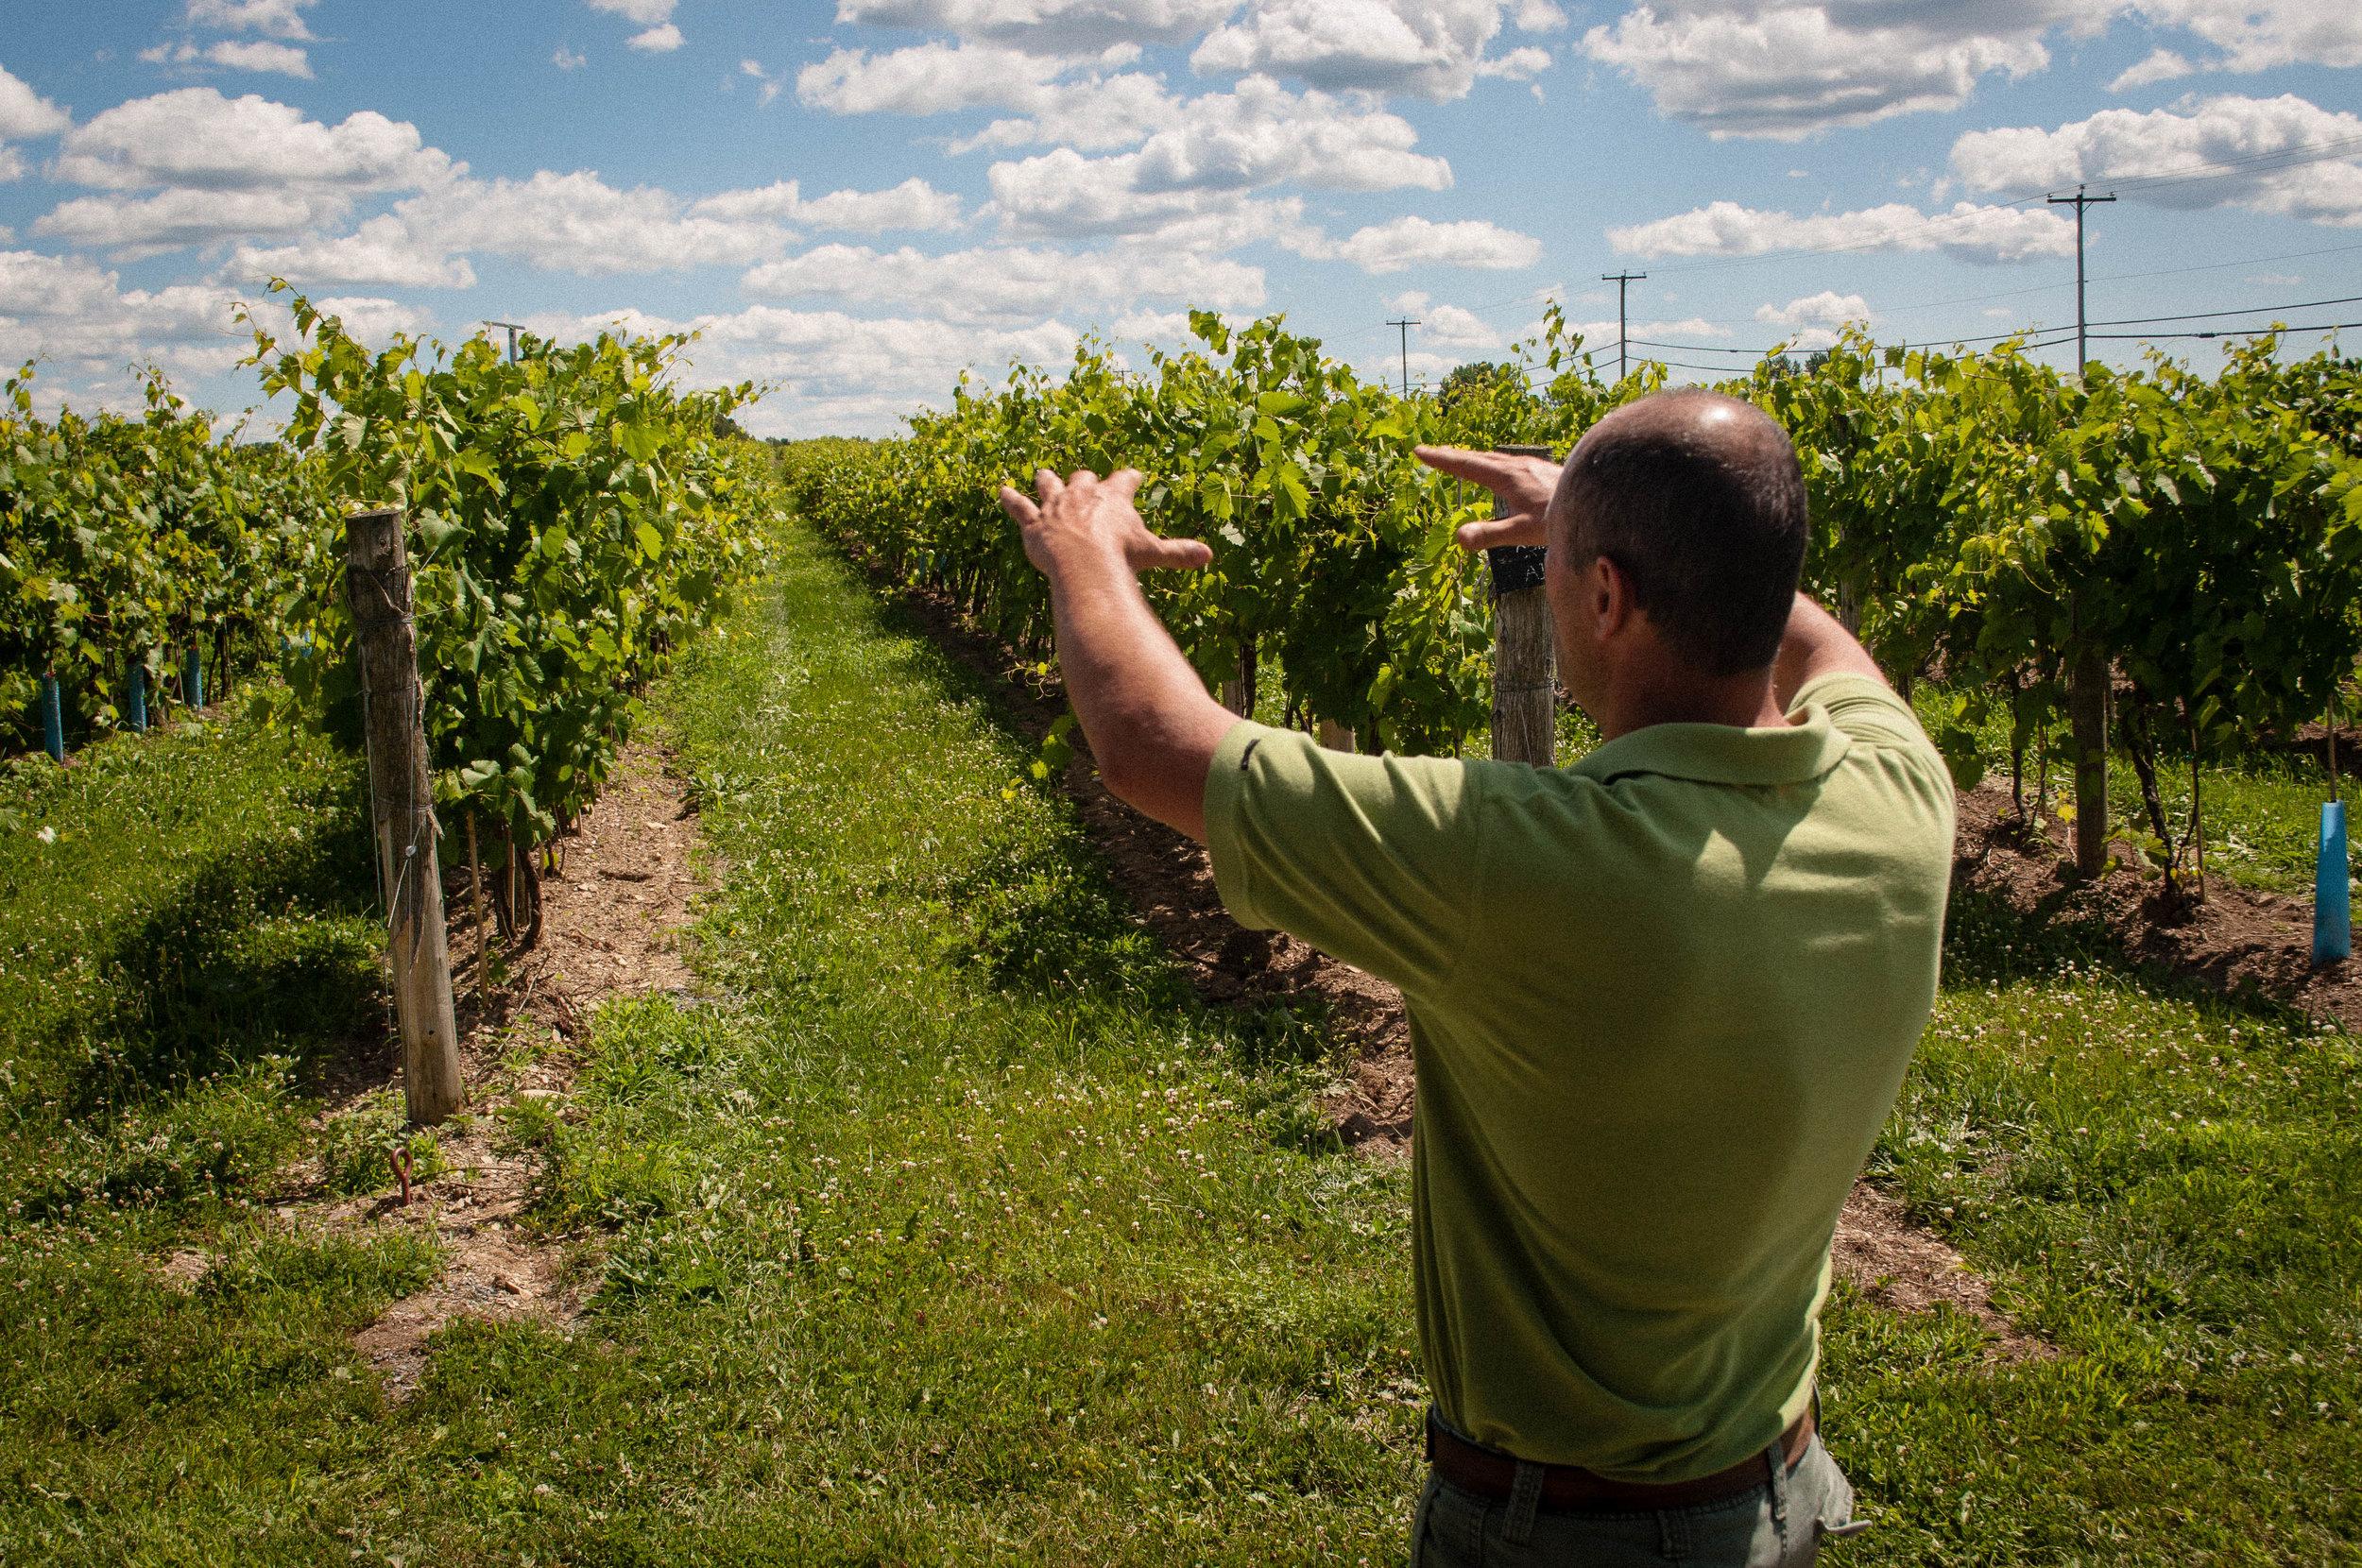 Vignoble La Bauge, a vineyard near Montreal